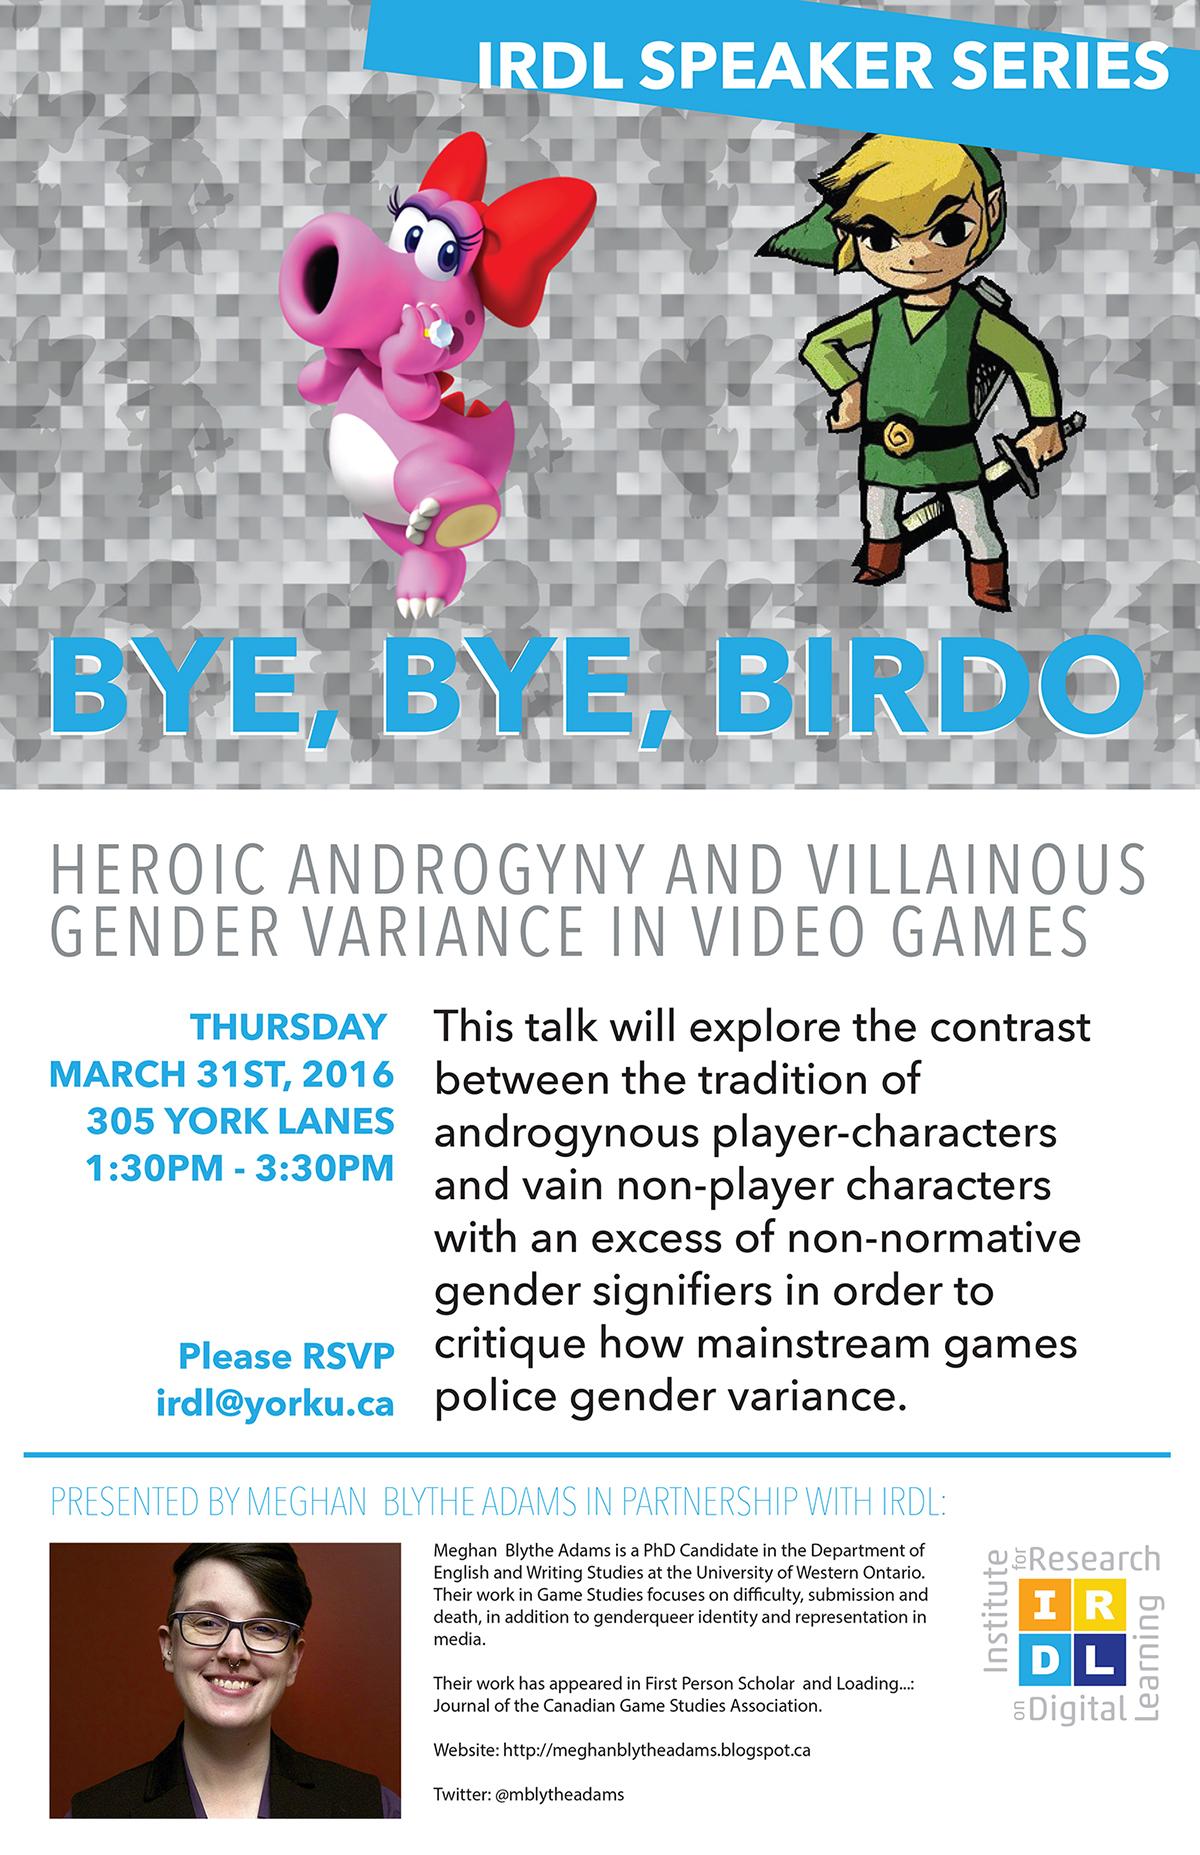 Bye, Bye, Birdo: Heroic Androgyny and Villainous Gender Variance in Video Games